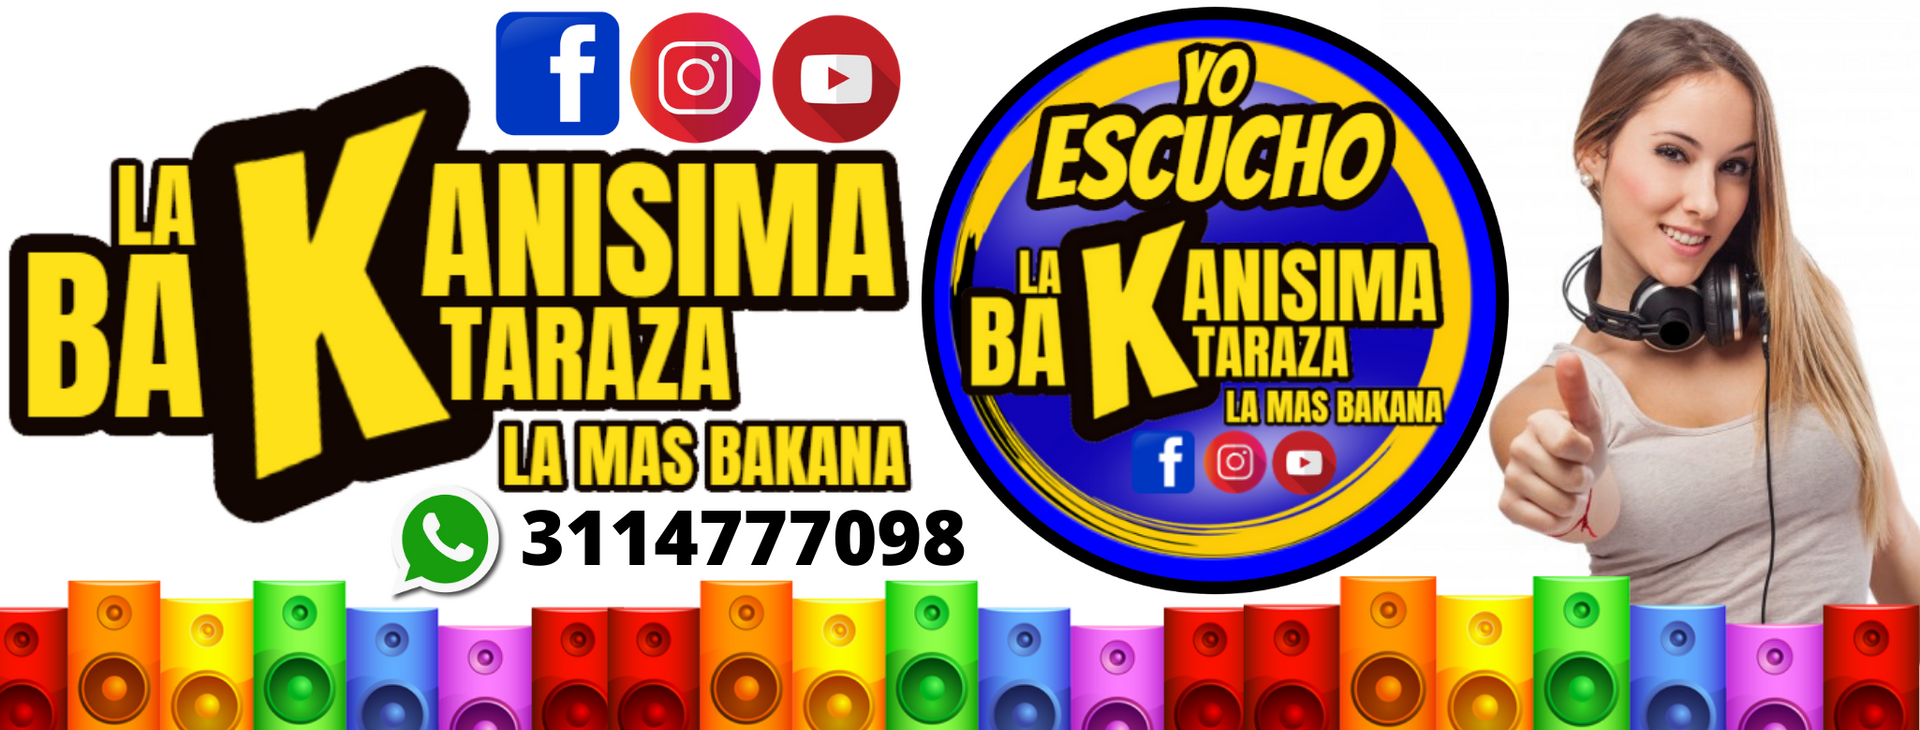 LA MAS BAKANISIMA TARAZA (1).png